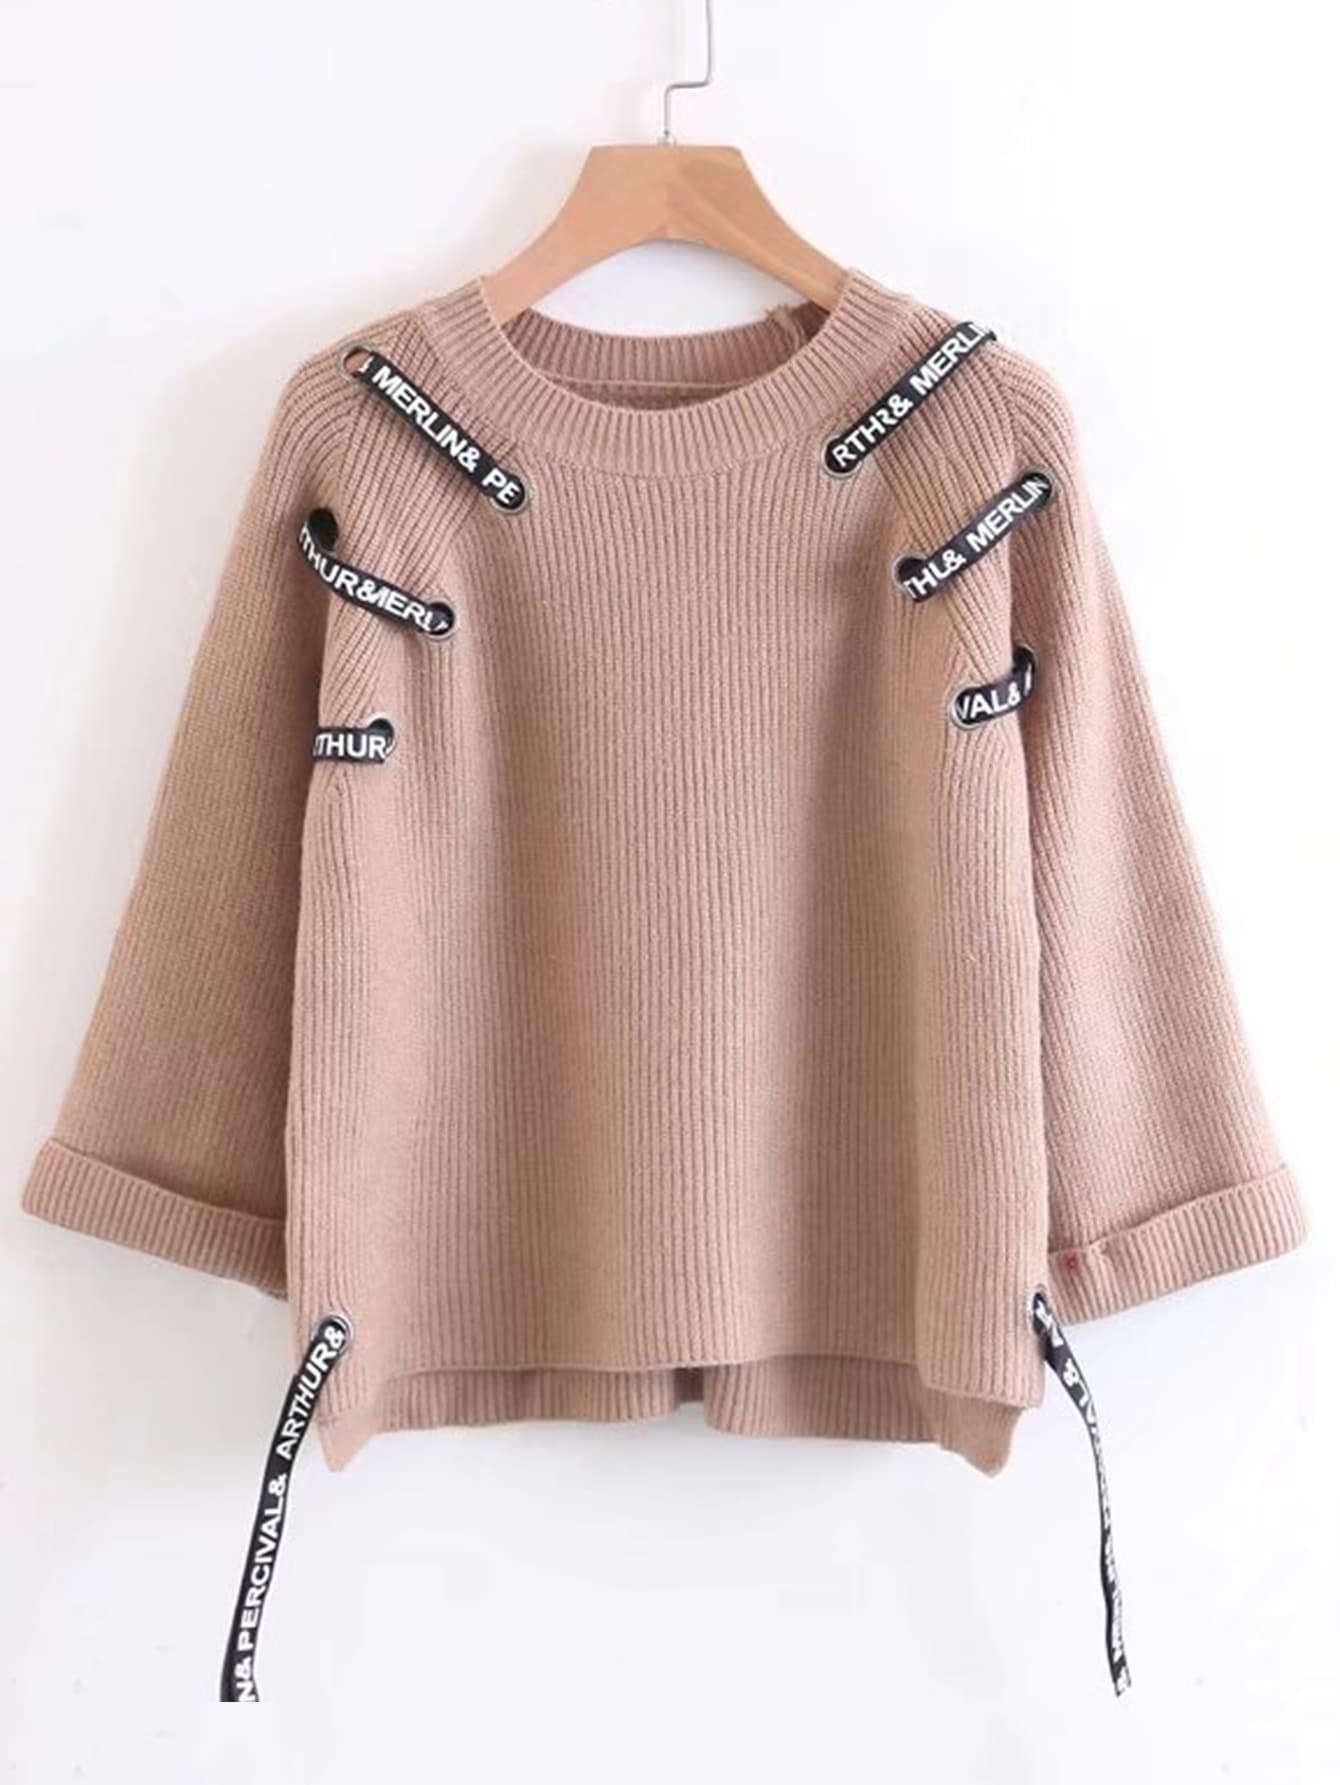 Slogan Strap Raglan Sleeve Ribbed Knitwear sweater170901204